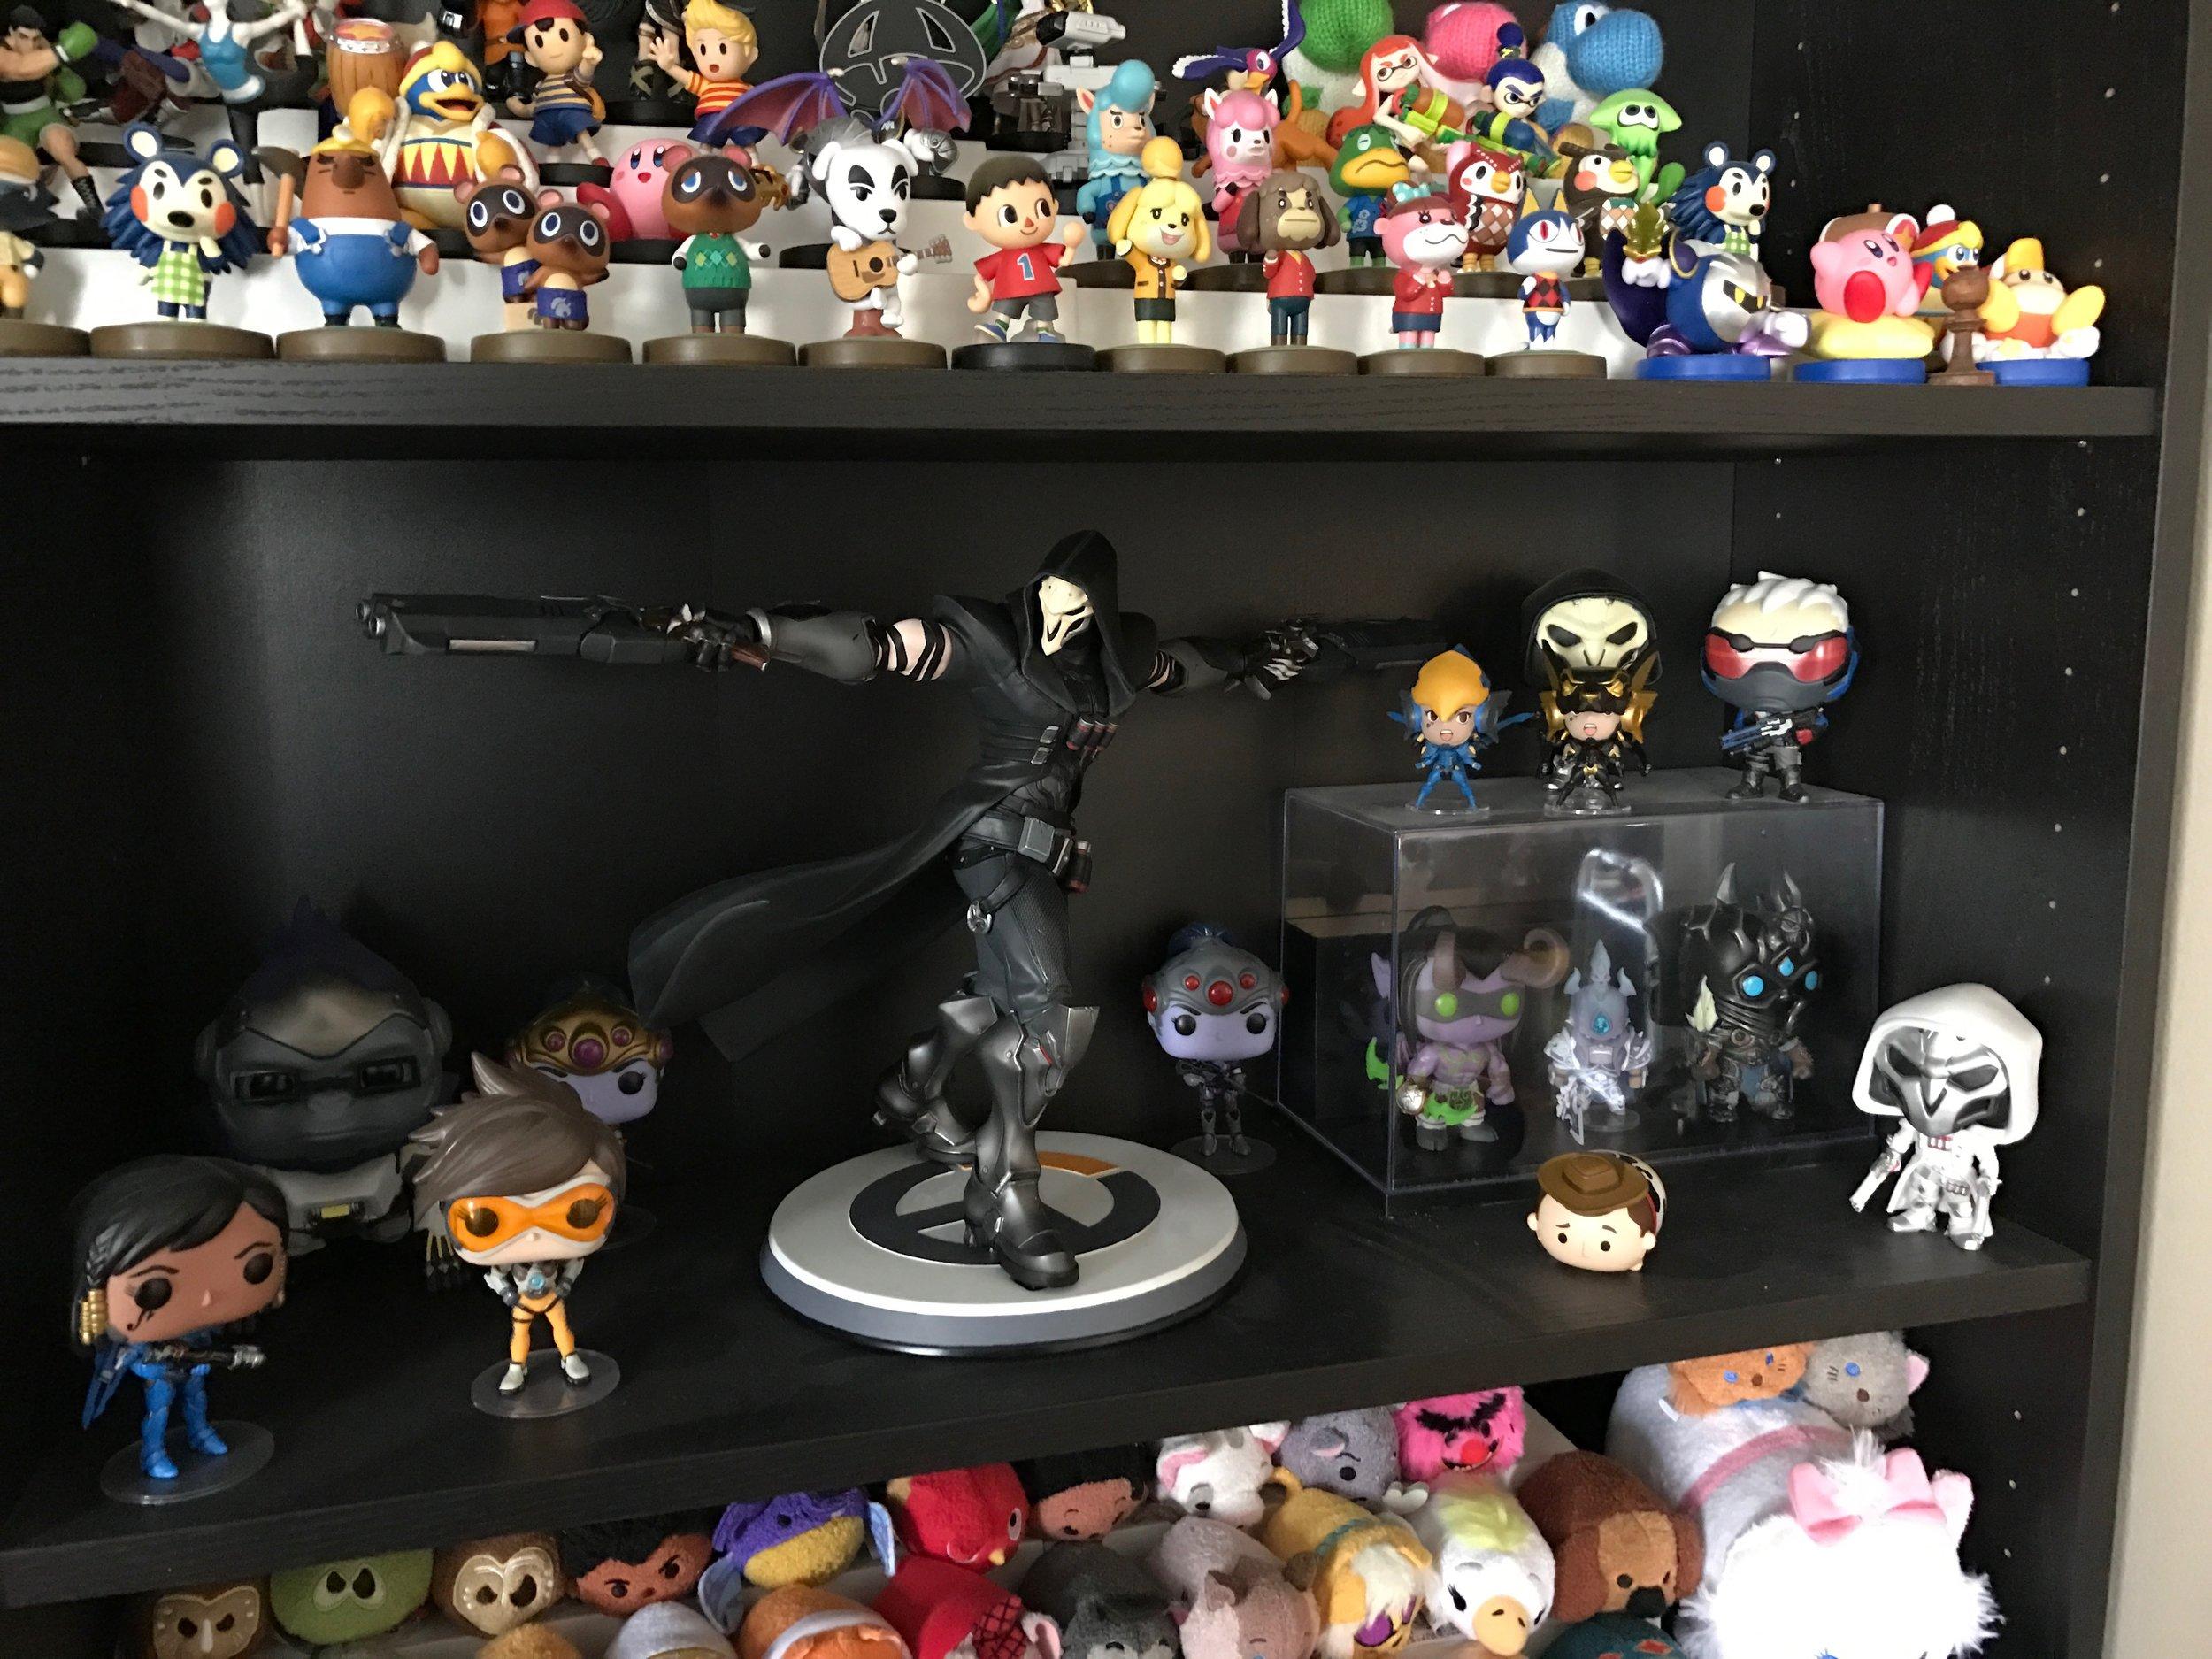 The Overwatch Shelf